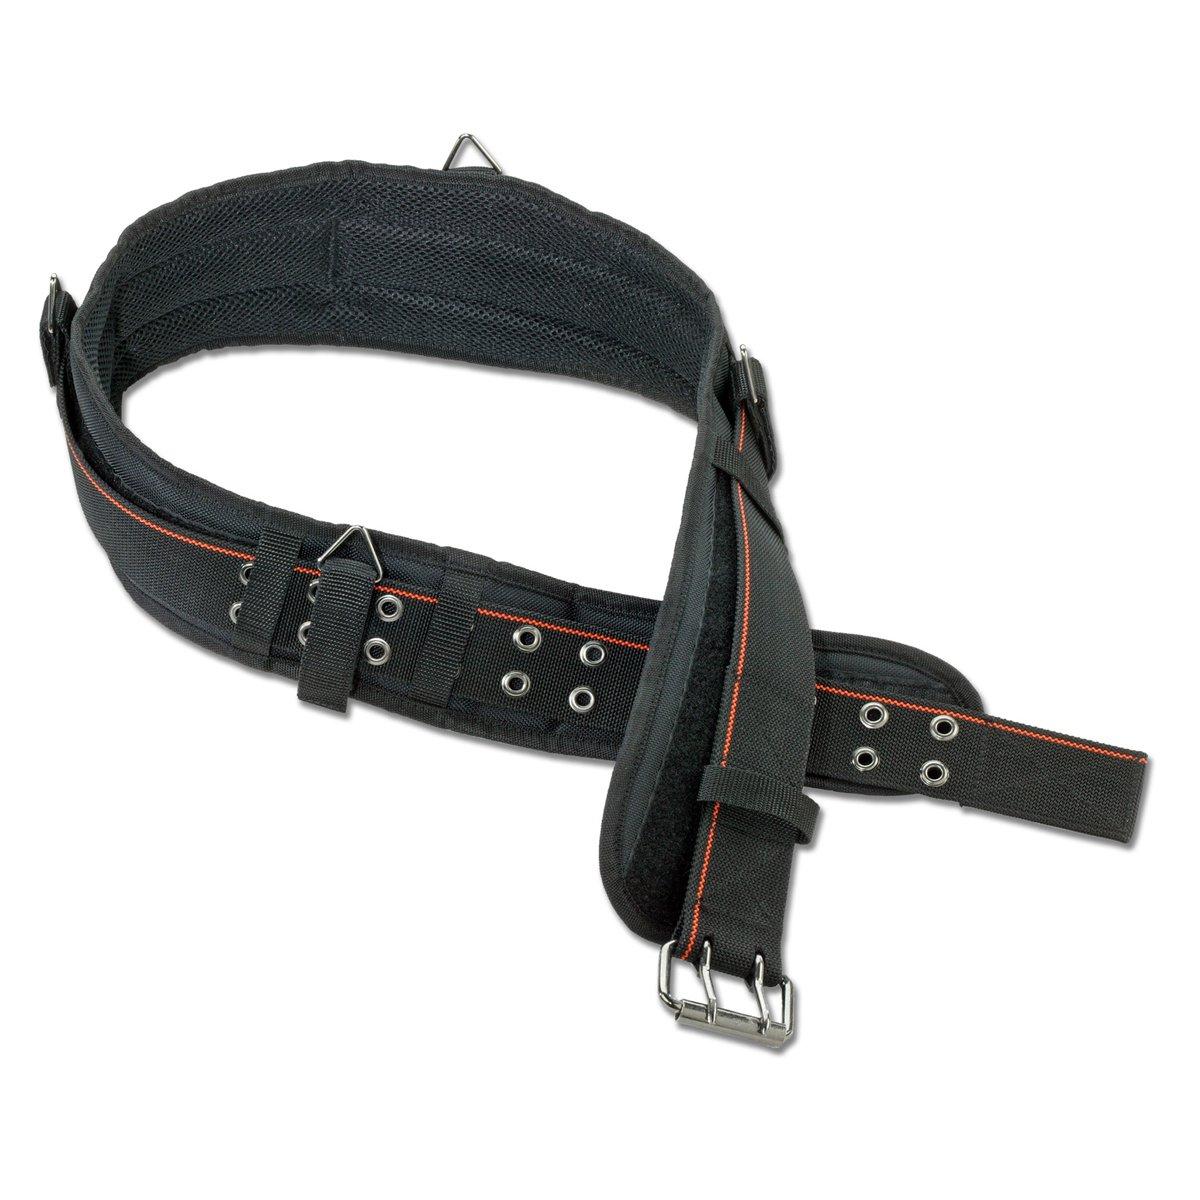 Ergodyne Arsenal 5550 Foam Padded Adjustable Tool/Work Belt, 2X-Large, Black